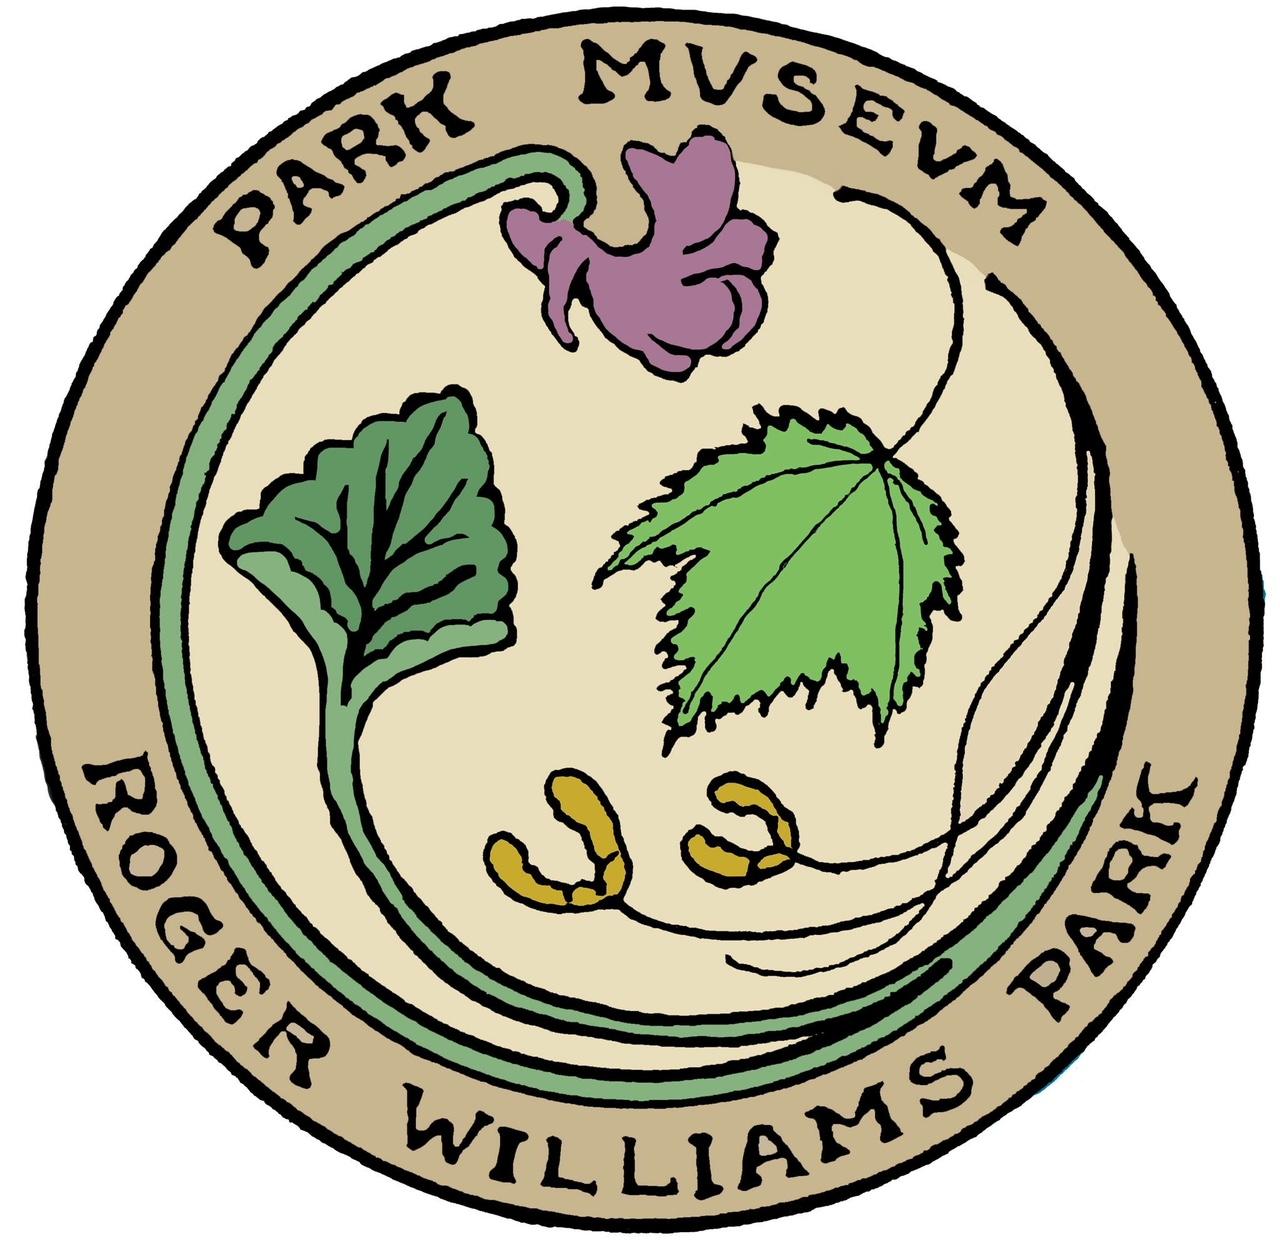 Museum of Natural History and Planetarium logo